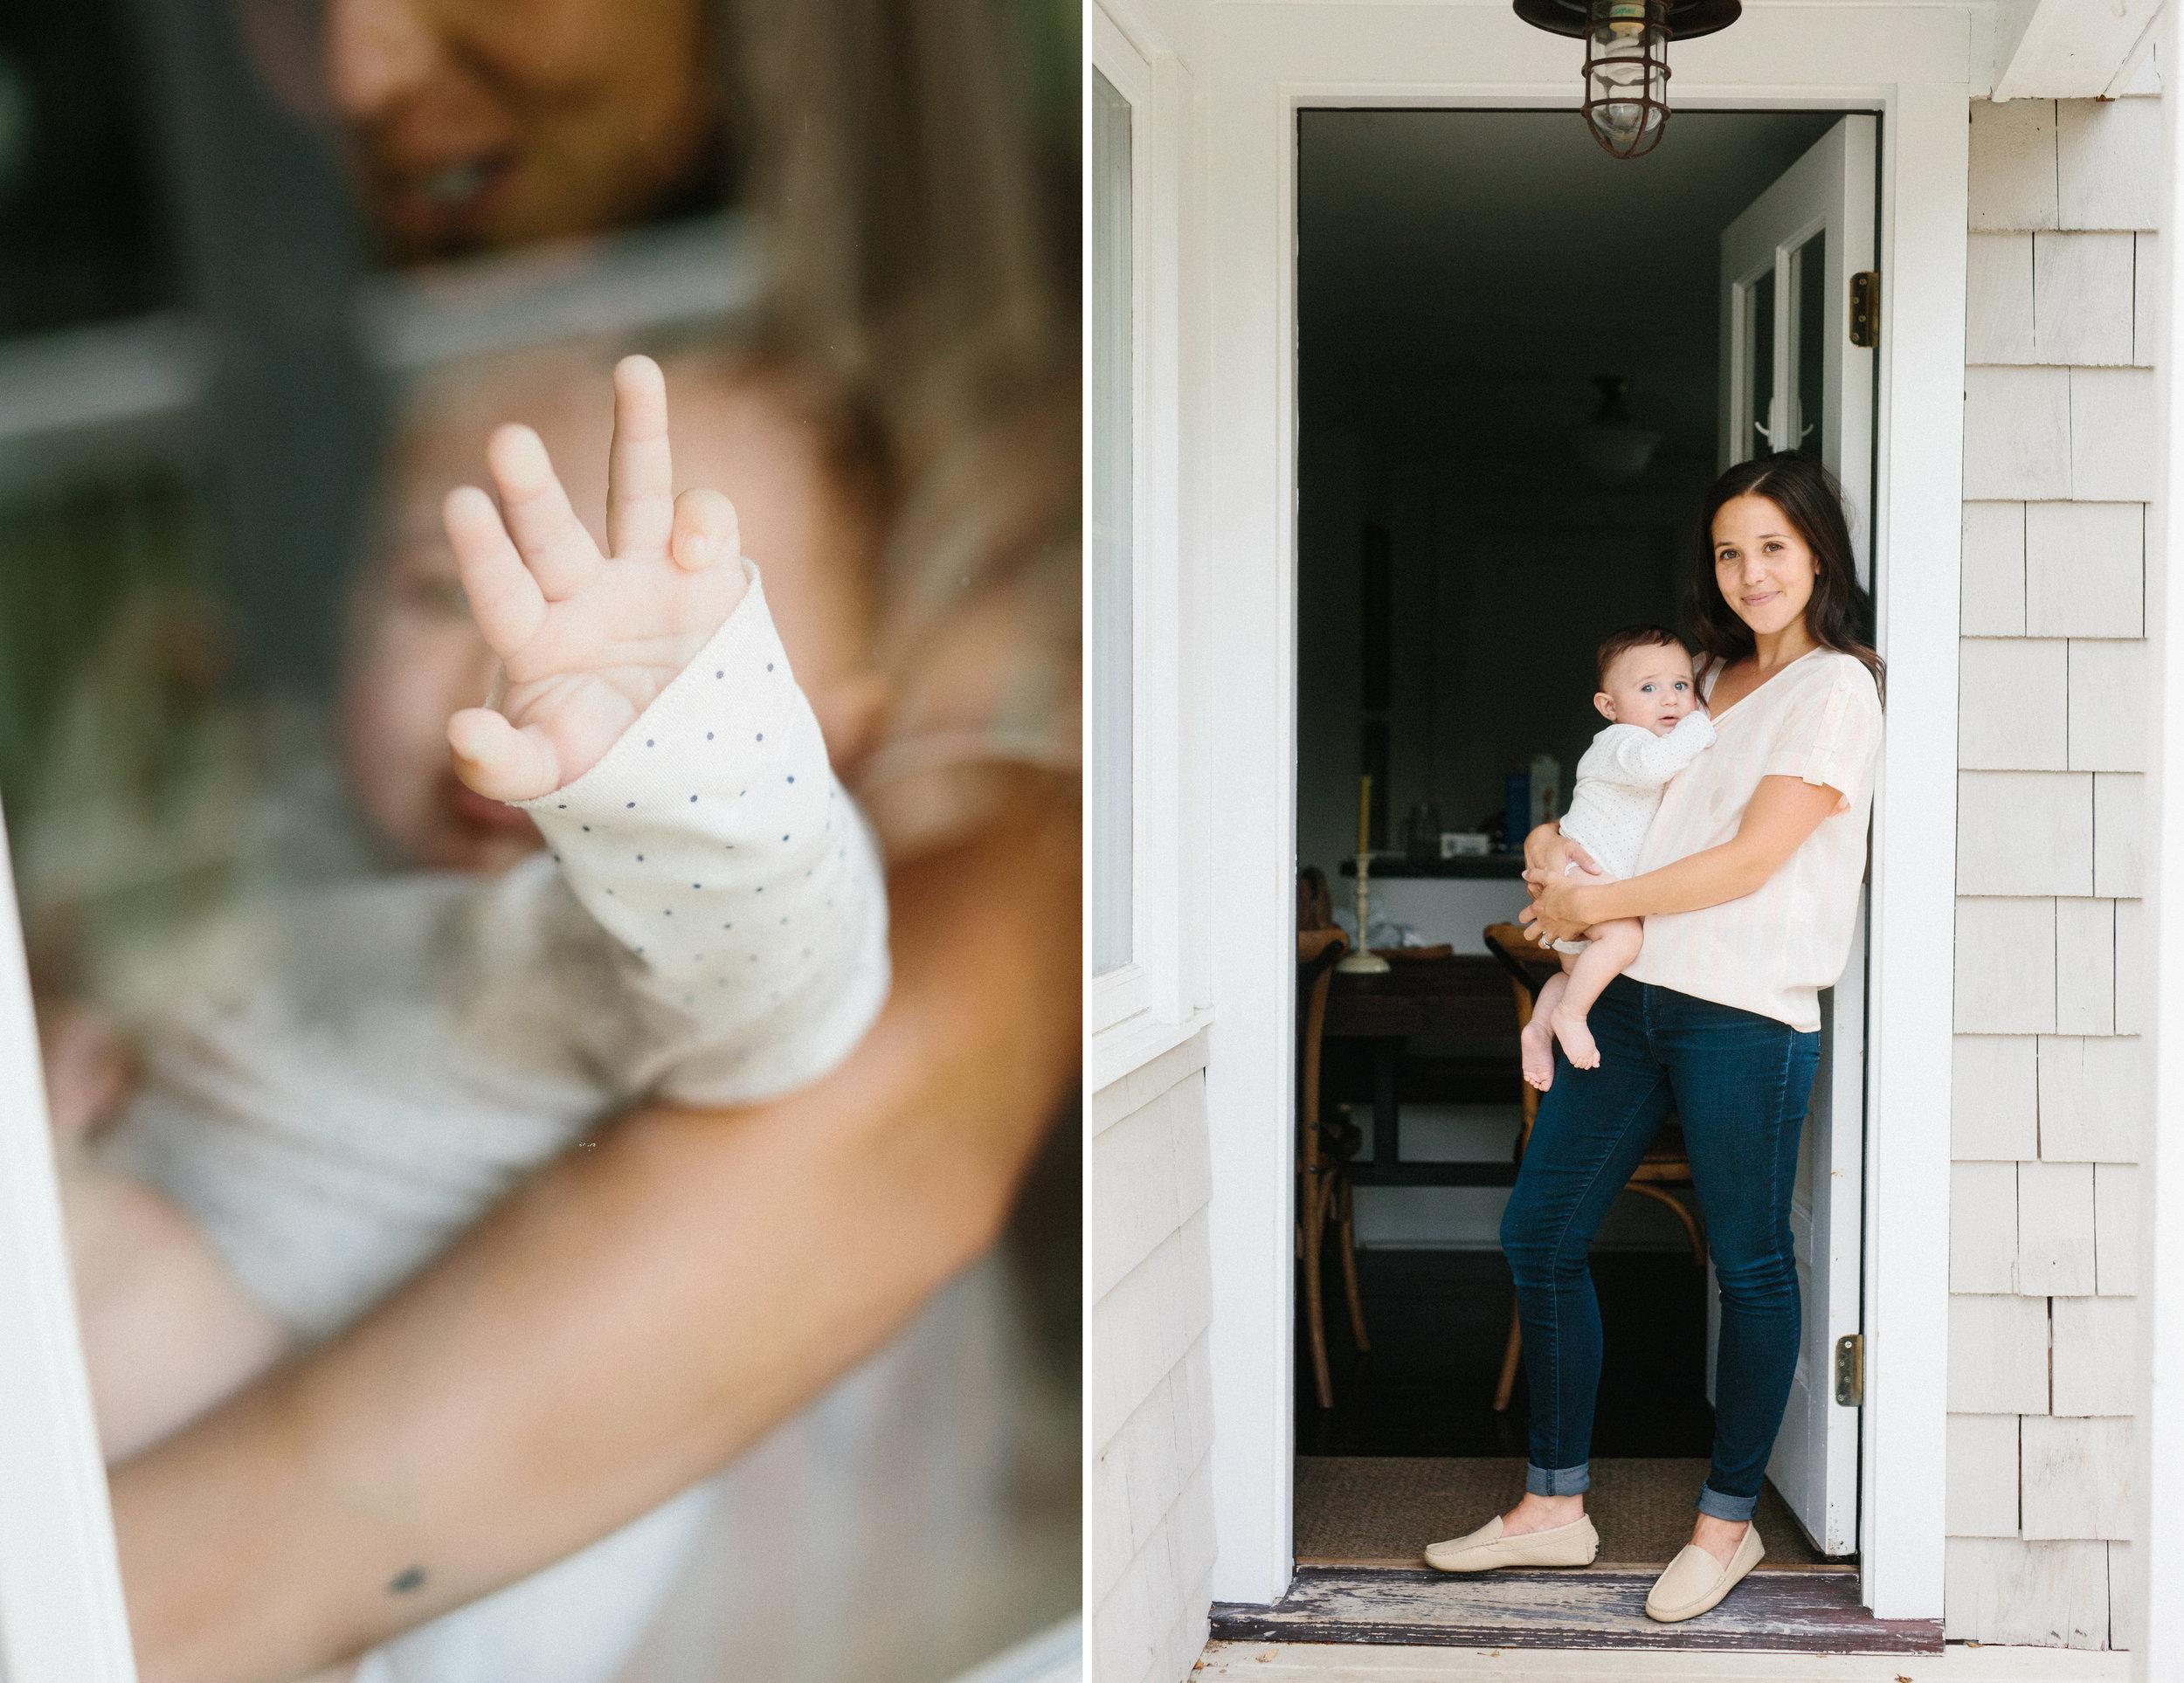 ashley-caroline_nicki-sebastian-photography_connecticut_california_family-photographer_baby-photography-4.jpg